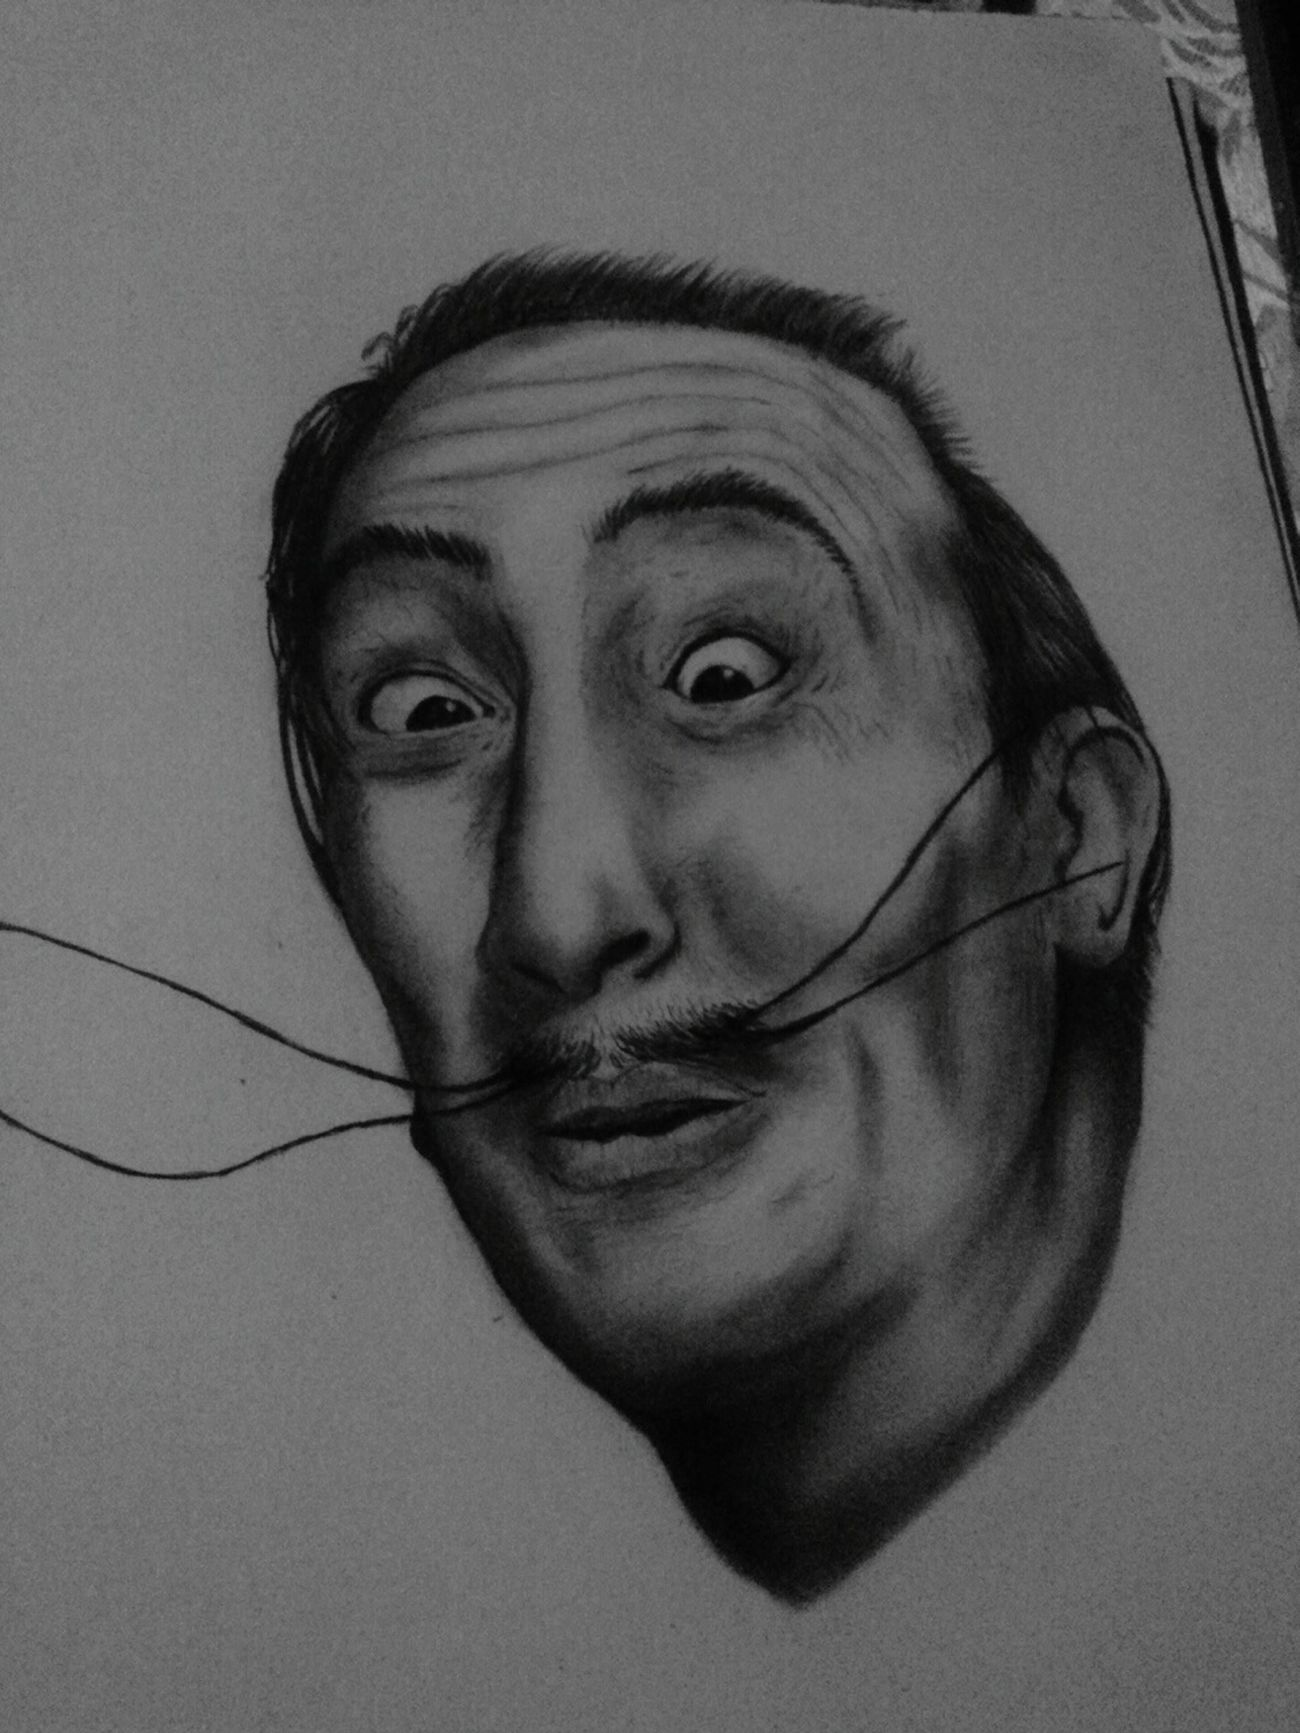 Dibujo A Lapiz Follow4follow Salvador Dali Salvadordali Rostro Dibujoartistico Negro Carboncillo Darwing Art